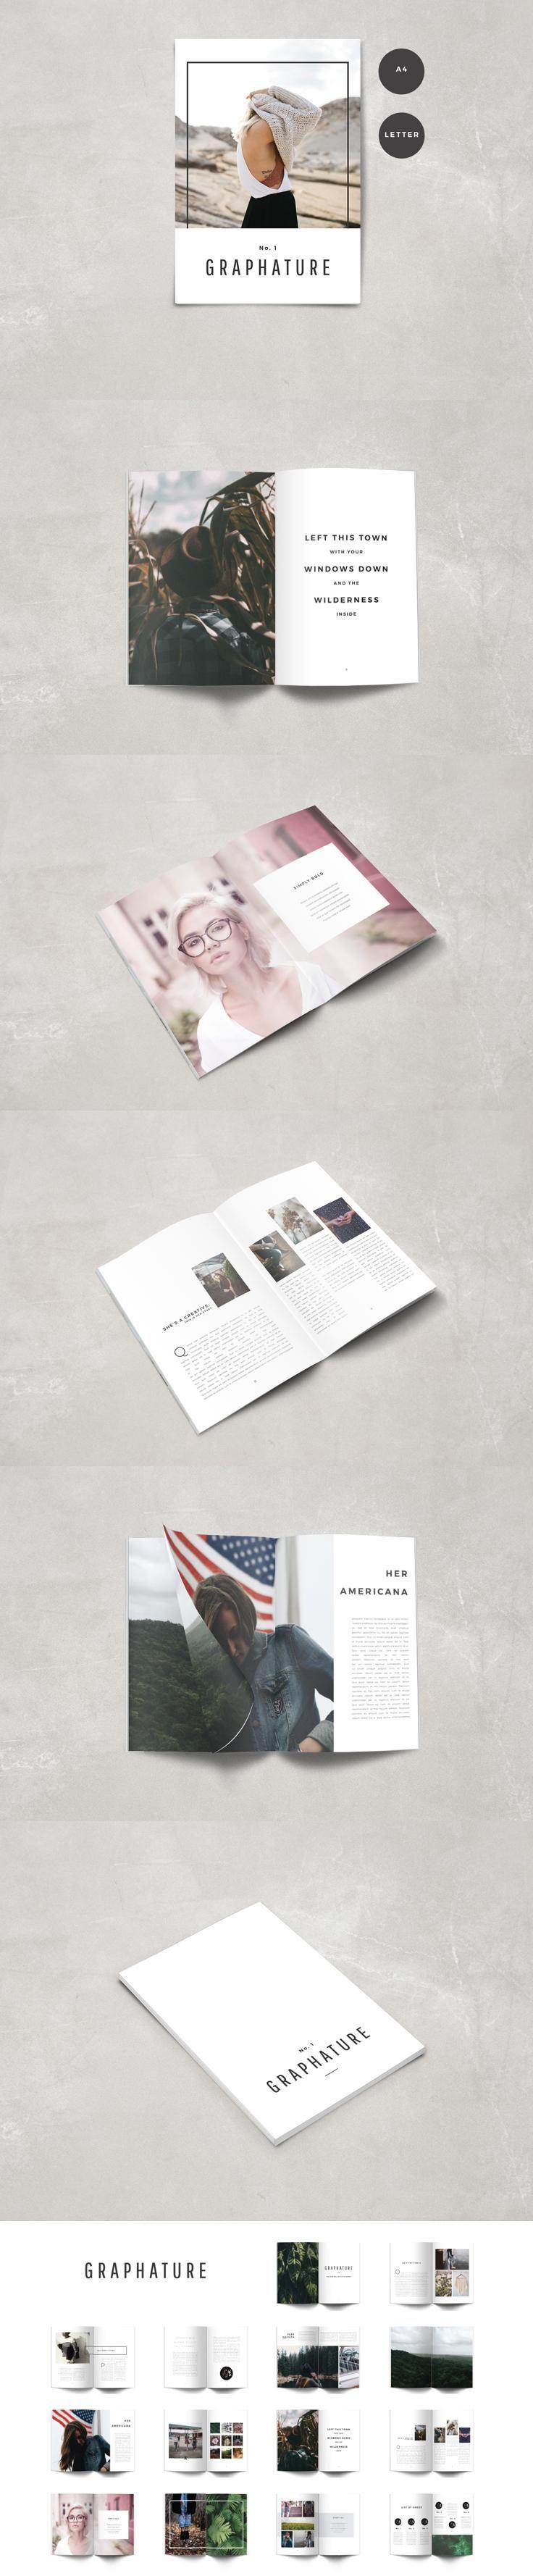 #magazine #design from The Routine Creative   DOWNLOAD: https://creativemarket.com/theroutinecreative/698074-Graphature-Magazine?u=zsoltczigler